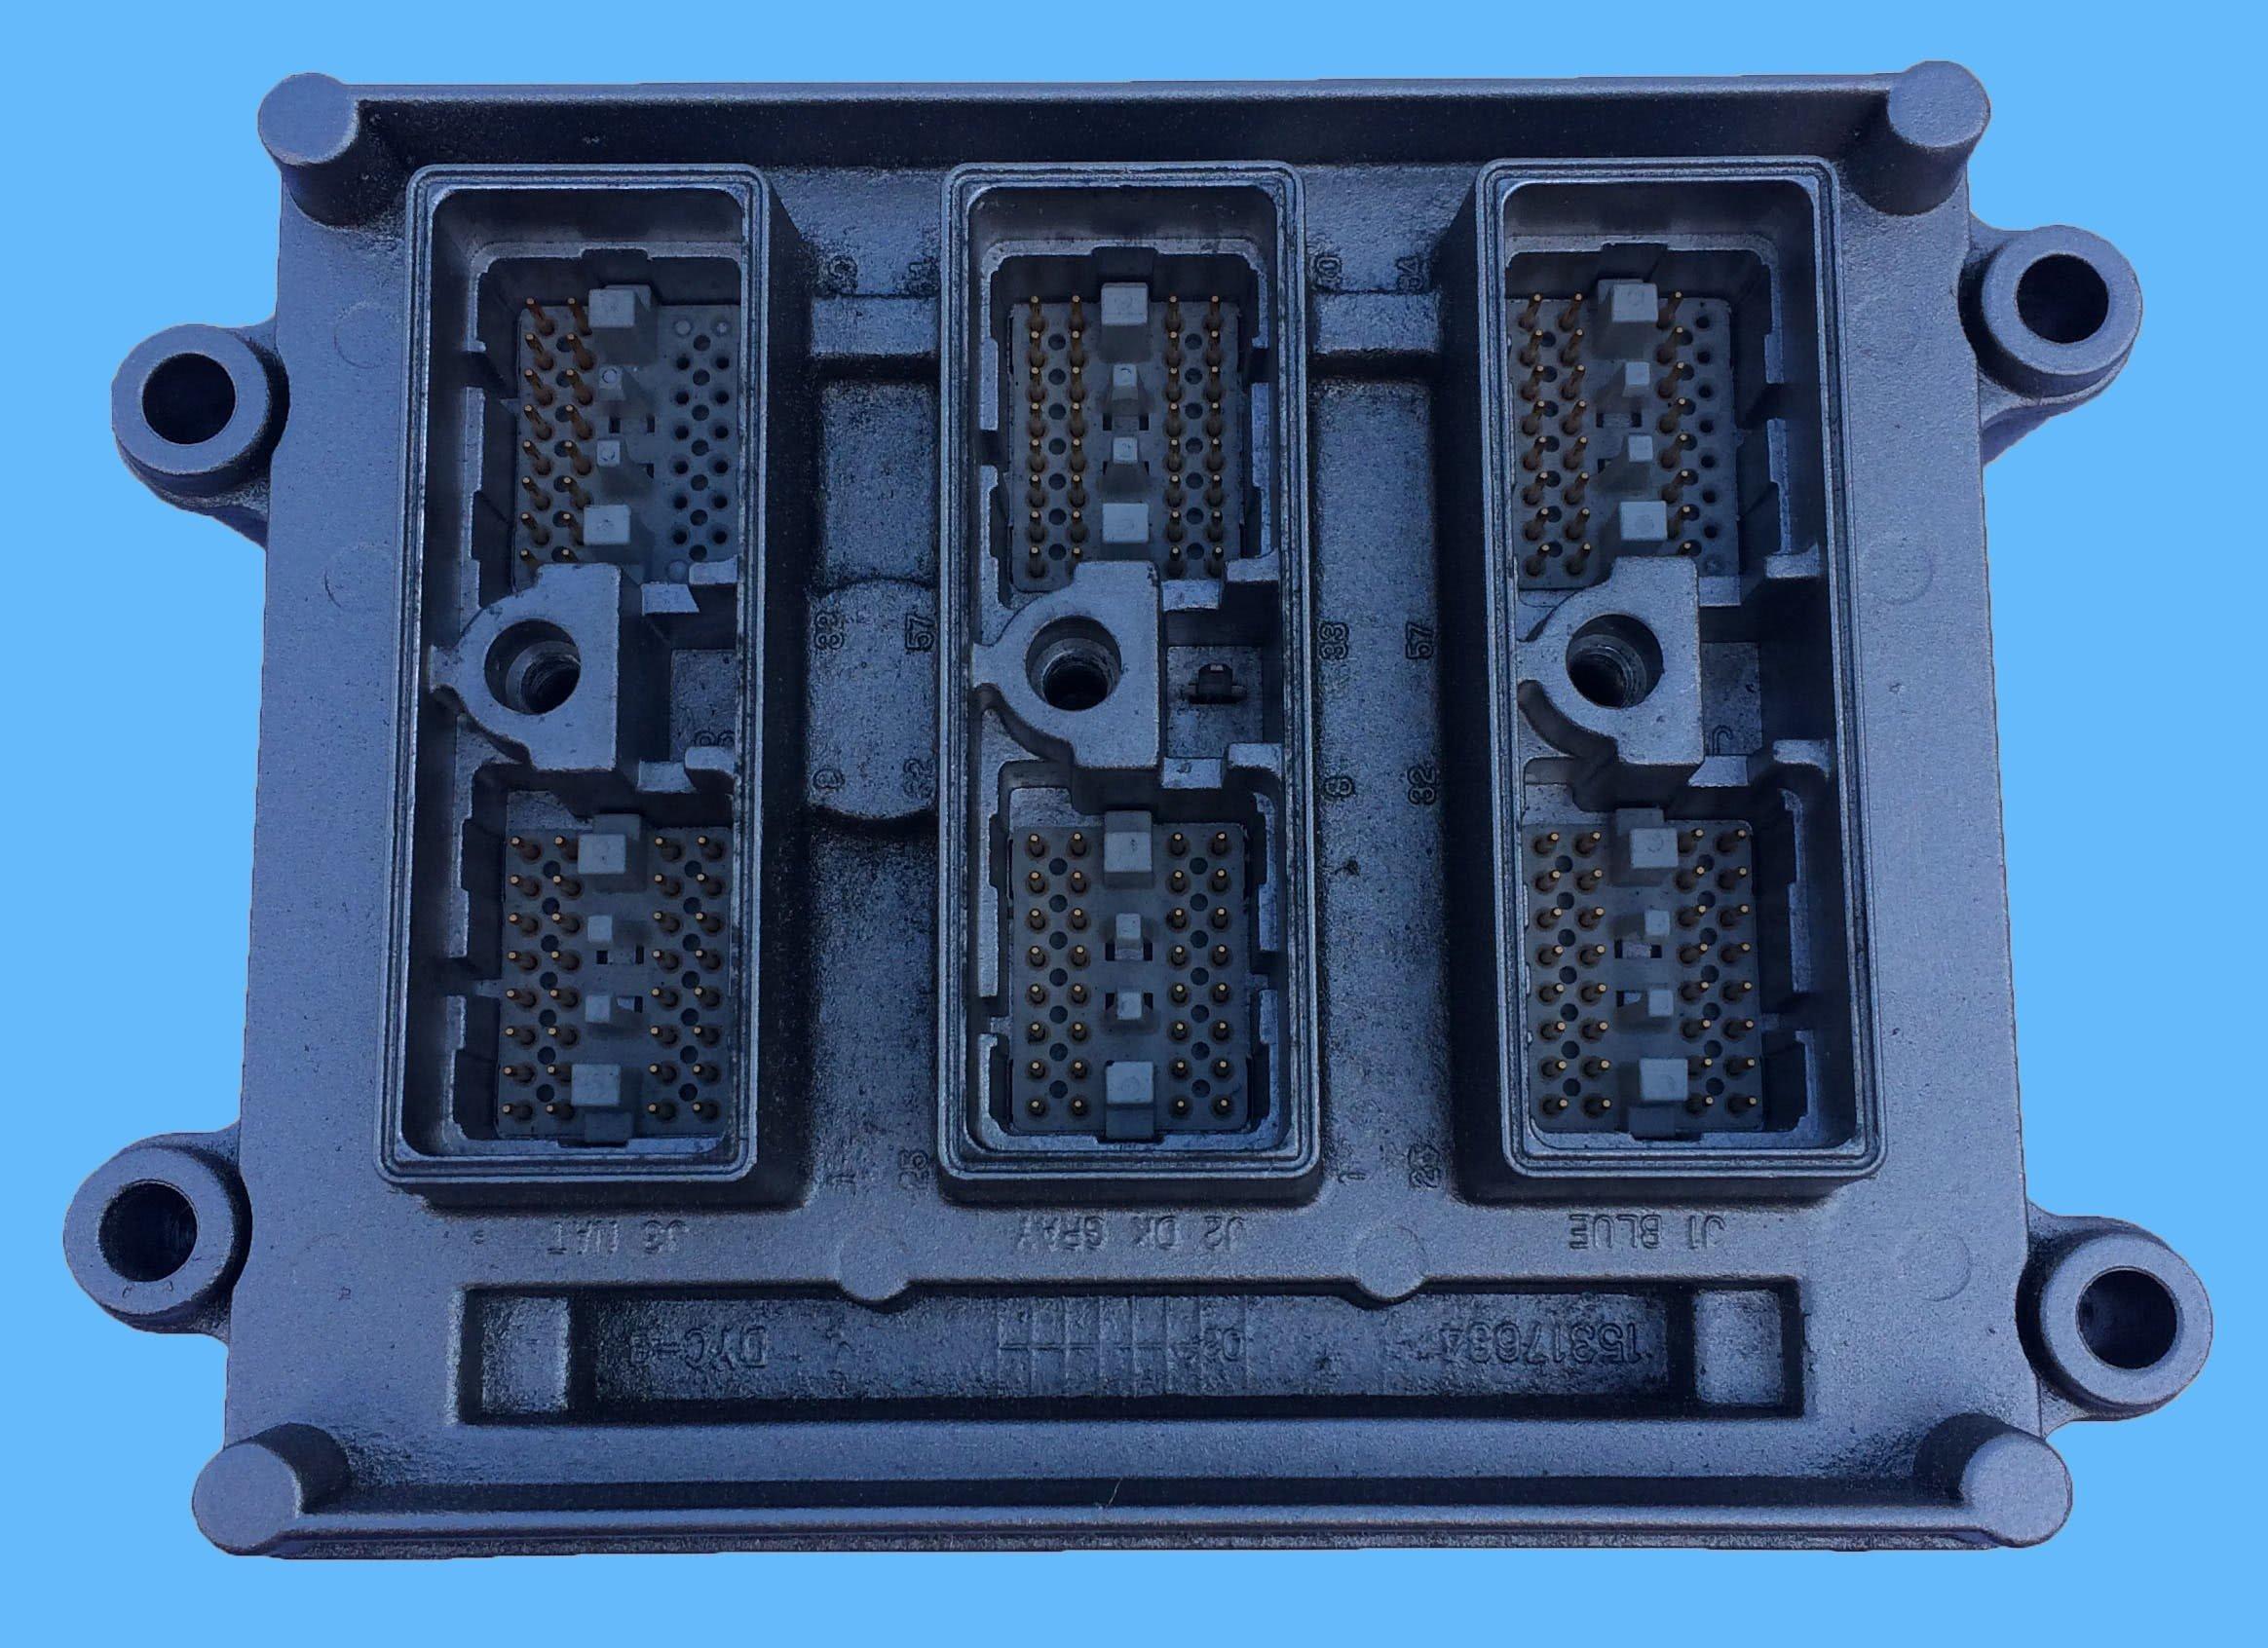 2004 Buick Rainier ECM 4.2L Gas Engine Control Module ECM / ECU - Engine Control Module